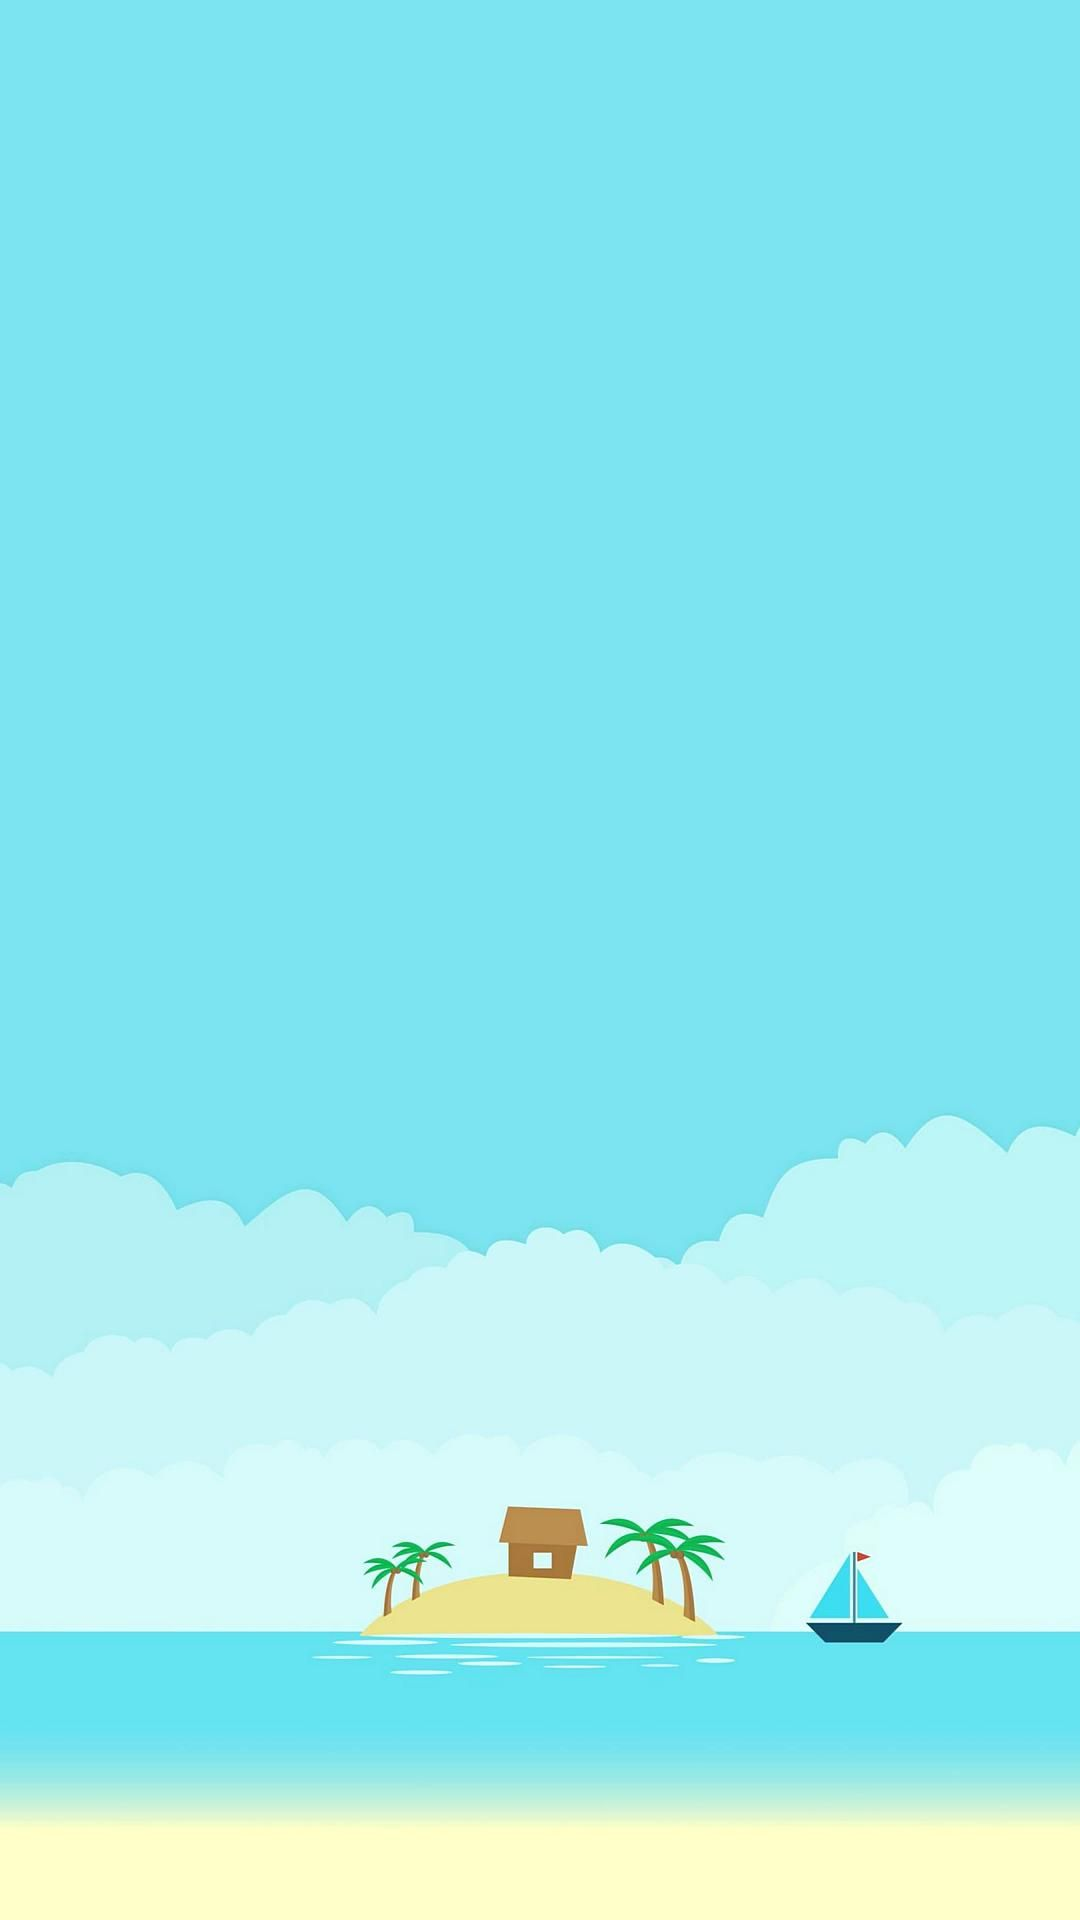 Island Simple Minimal Android Ultra HD 4K Wallpapers Free ⋆ Traxzee